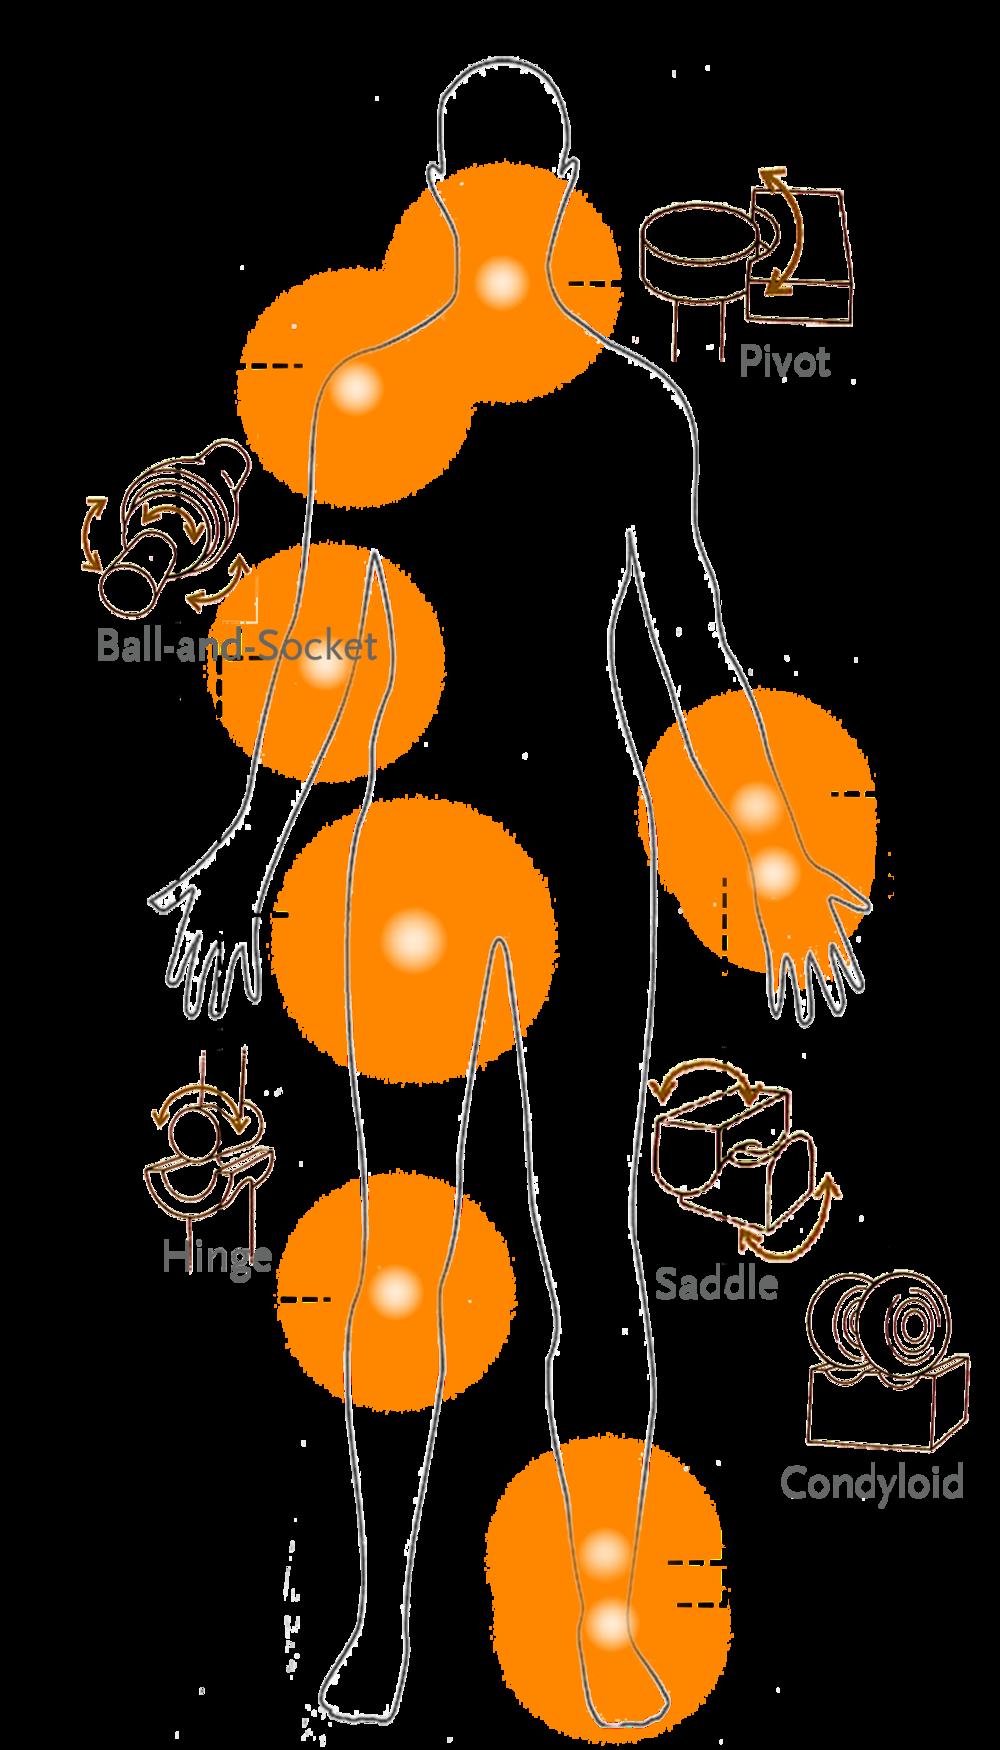 Hybrid Skins Extraterrestrial Interventions Karen Asmar Saddle Joint Diagram Study Of Body Articulations